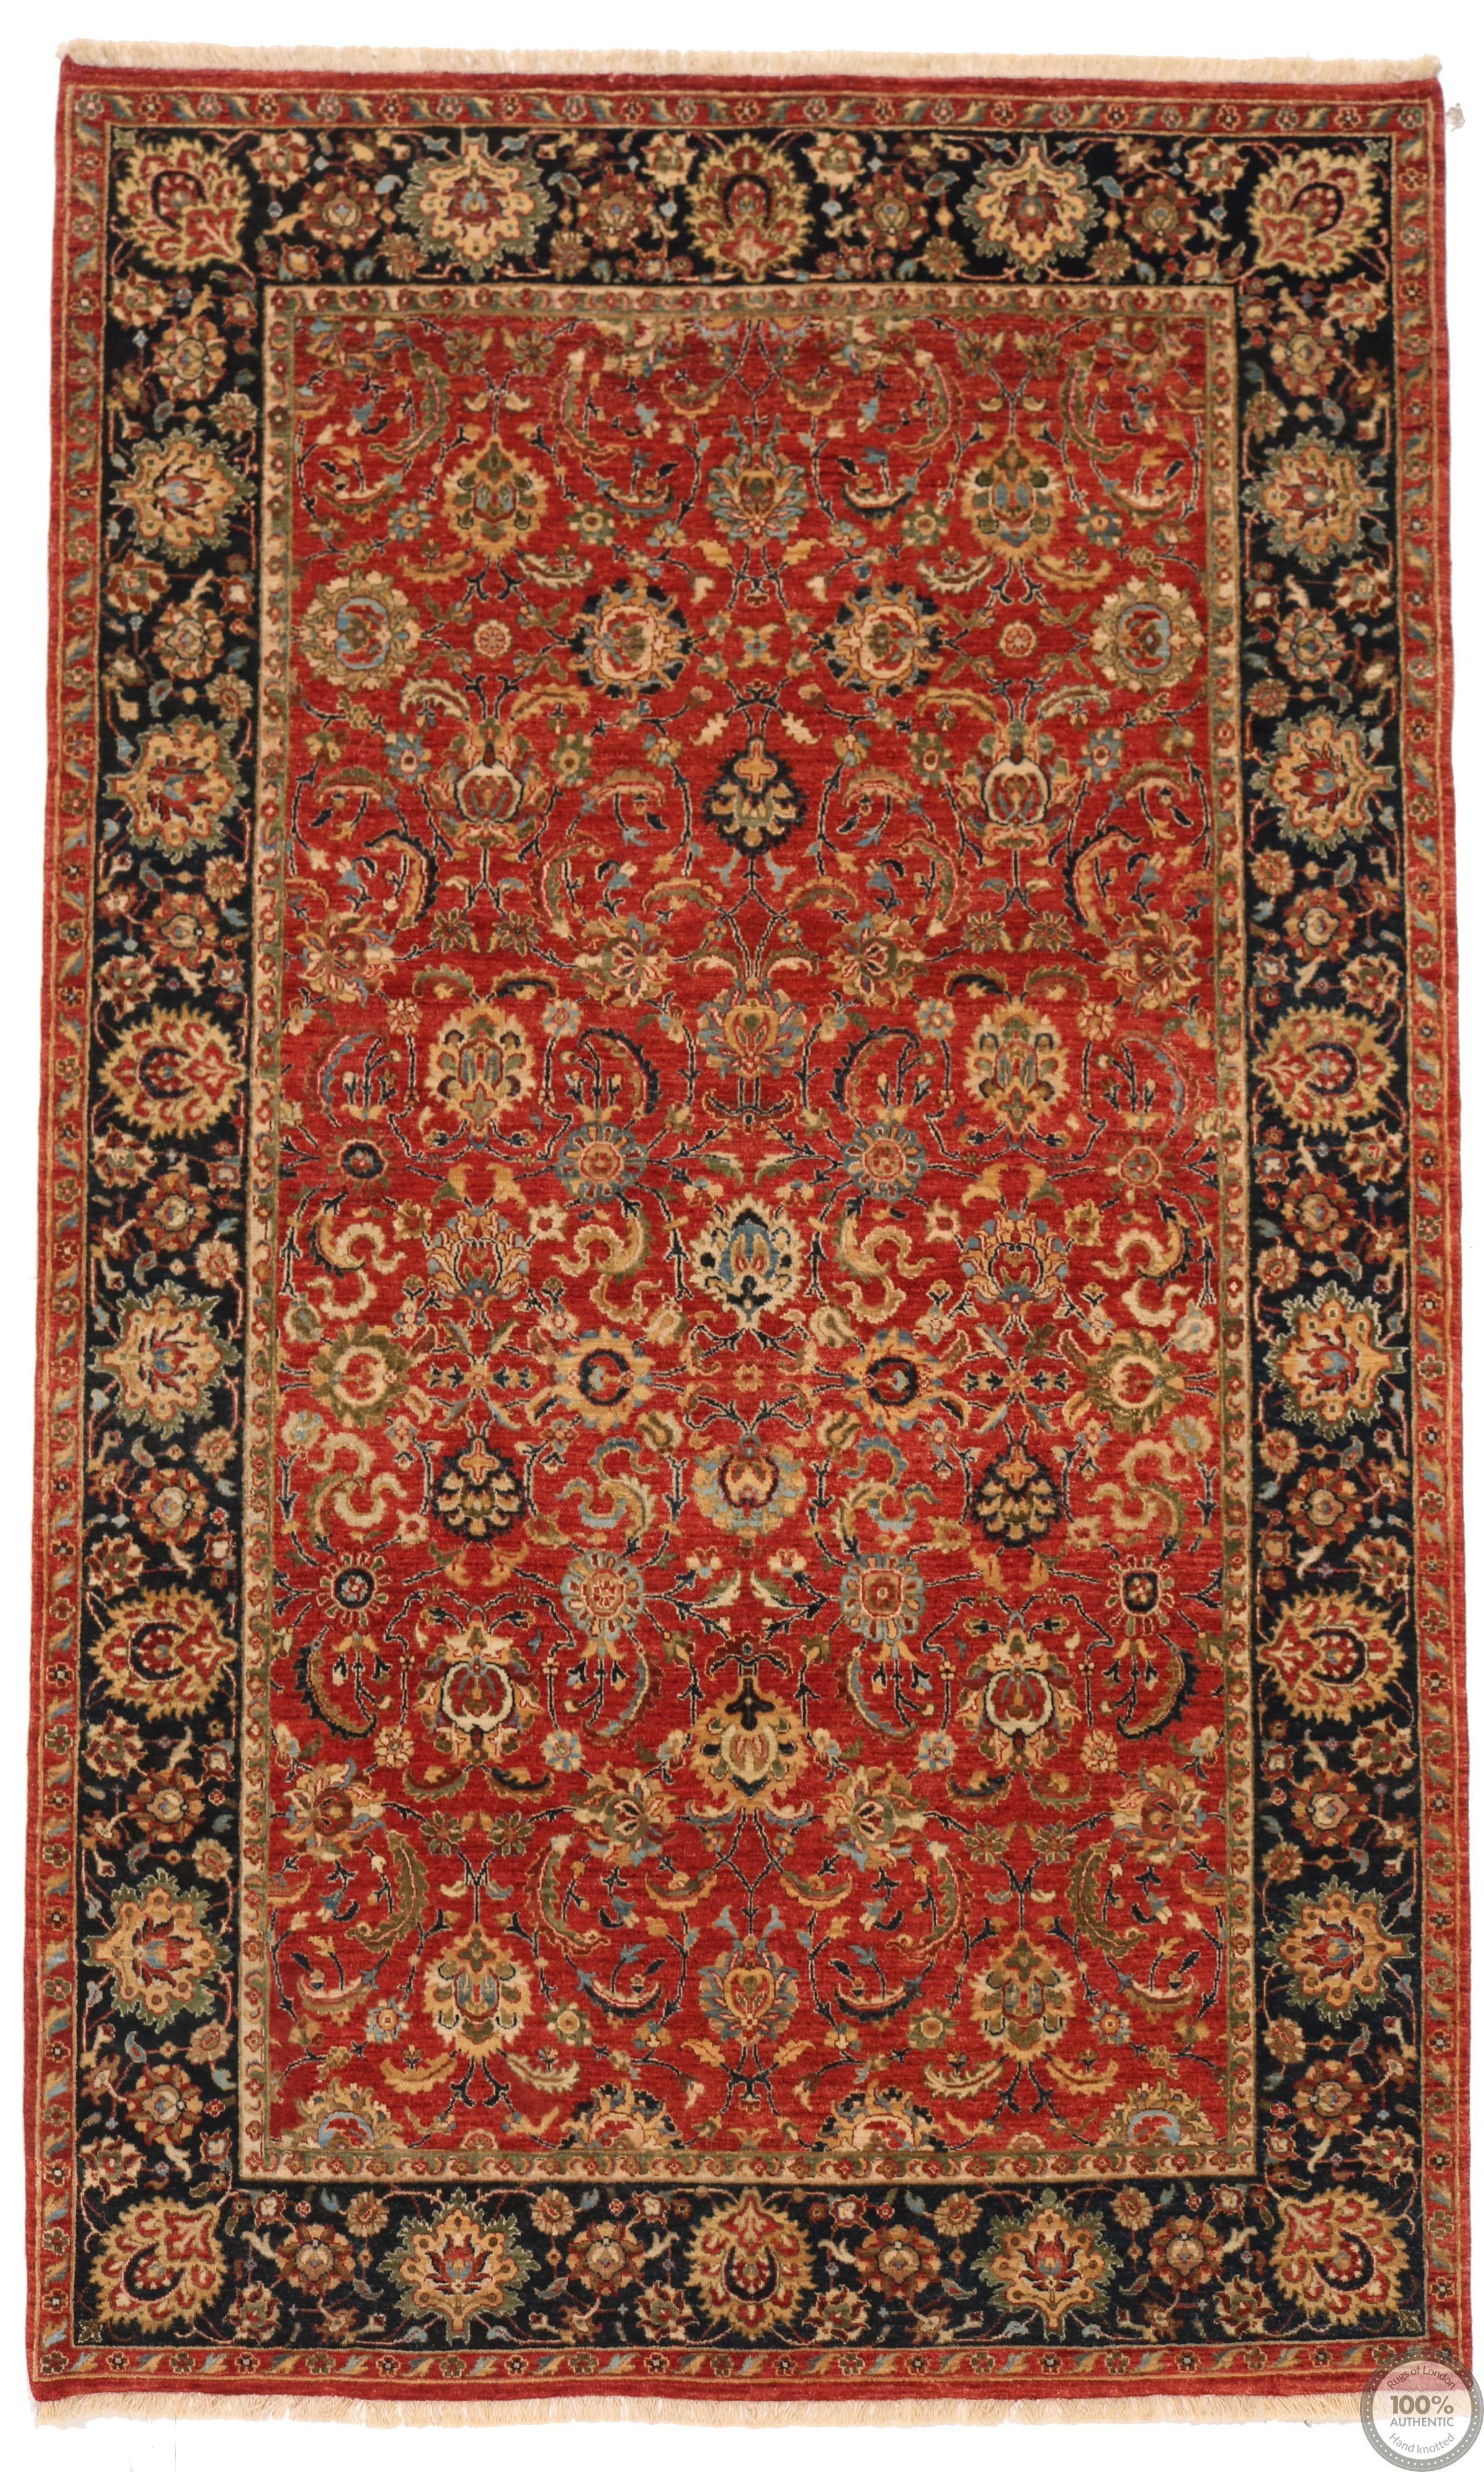 Fine Garous Ziegler design Indian rug 8'2 x 5